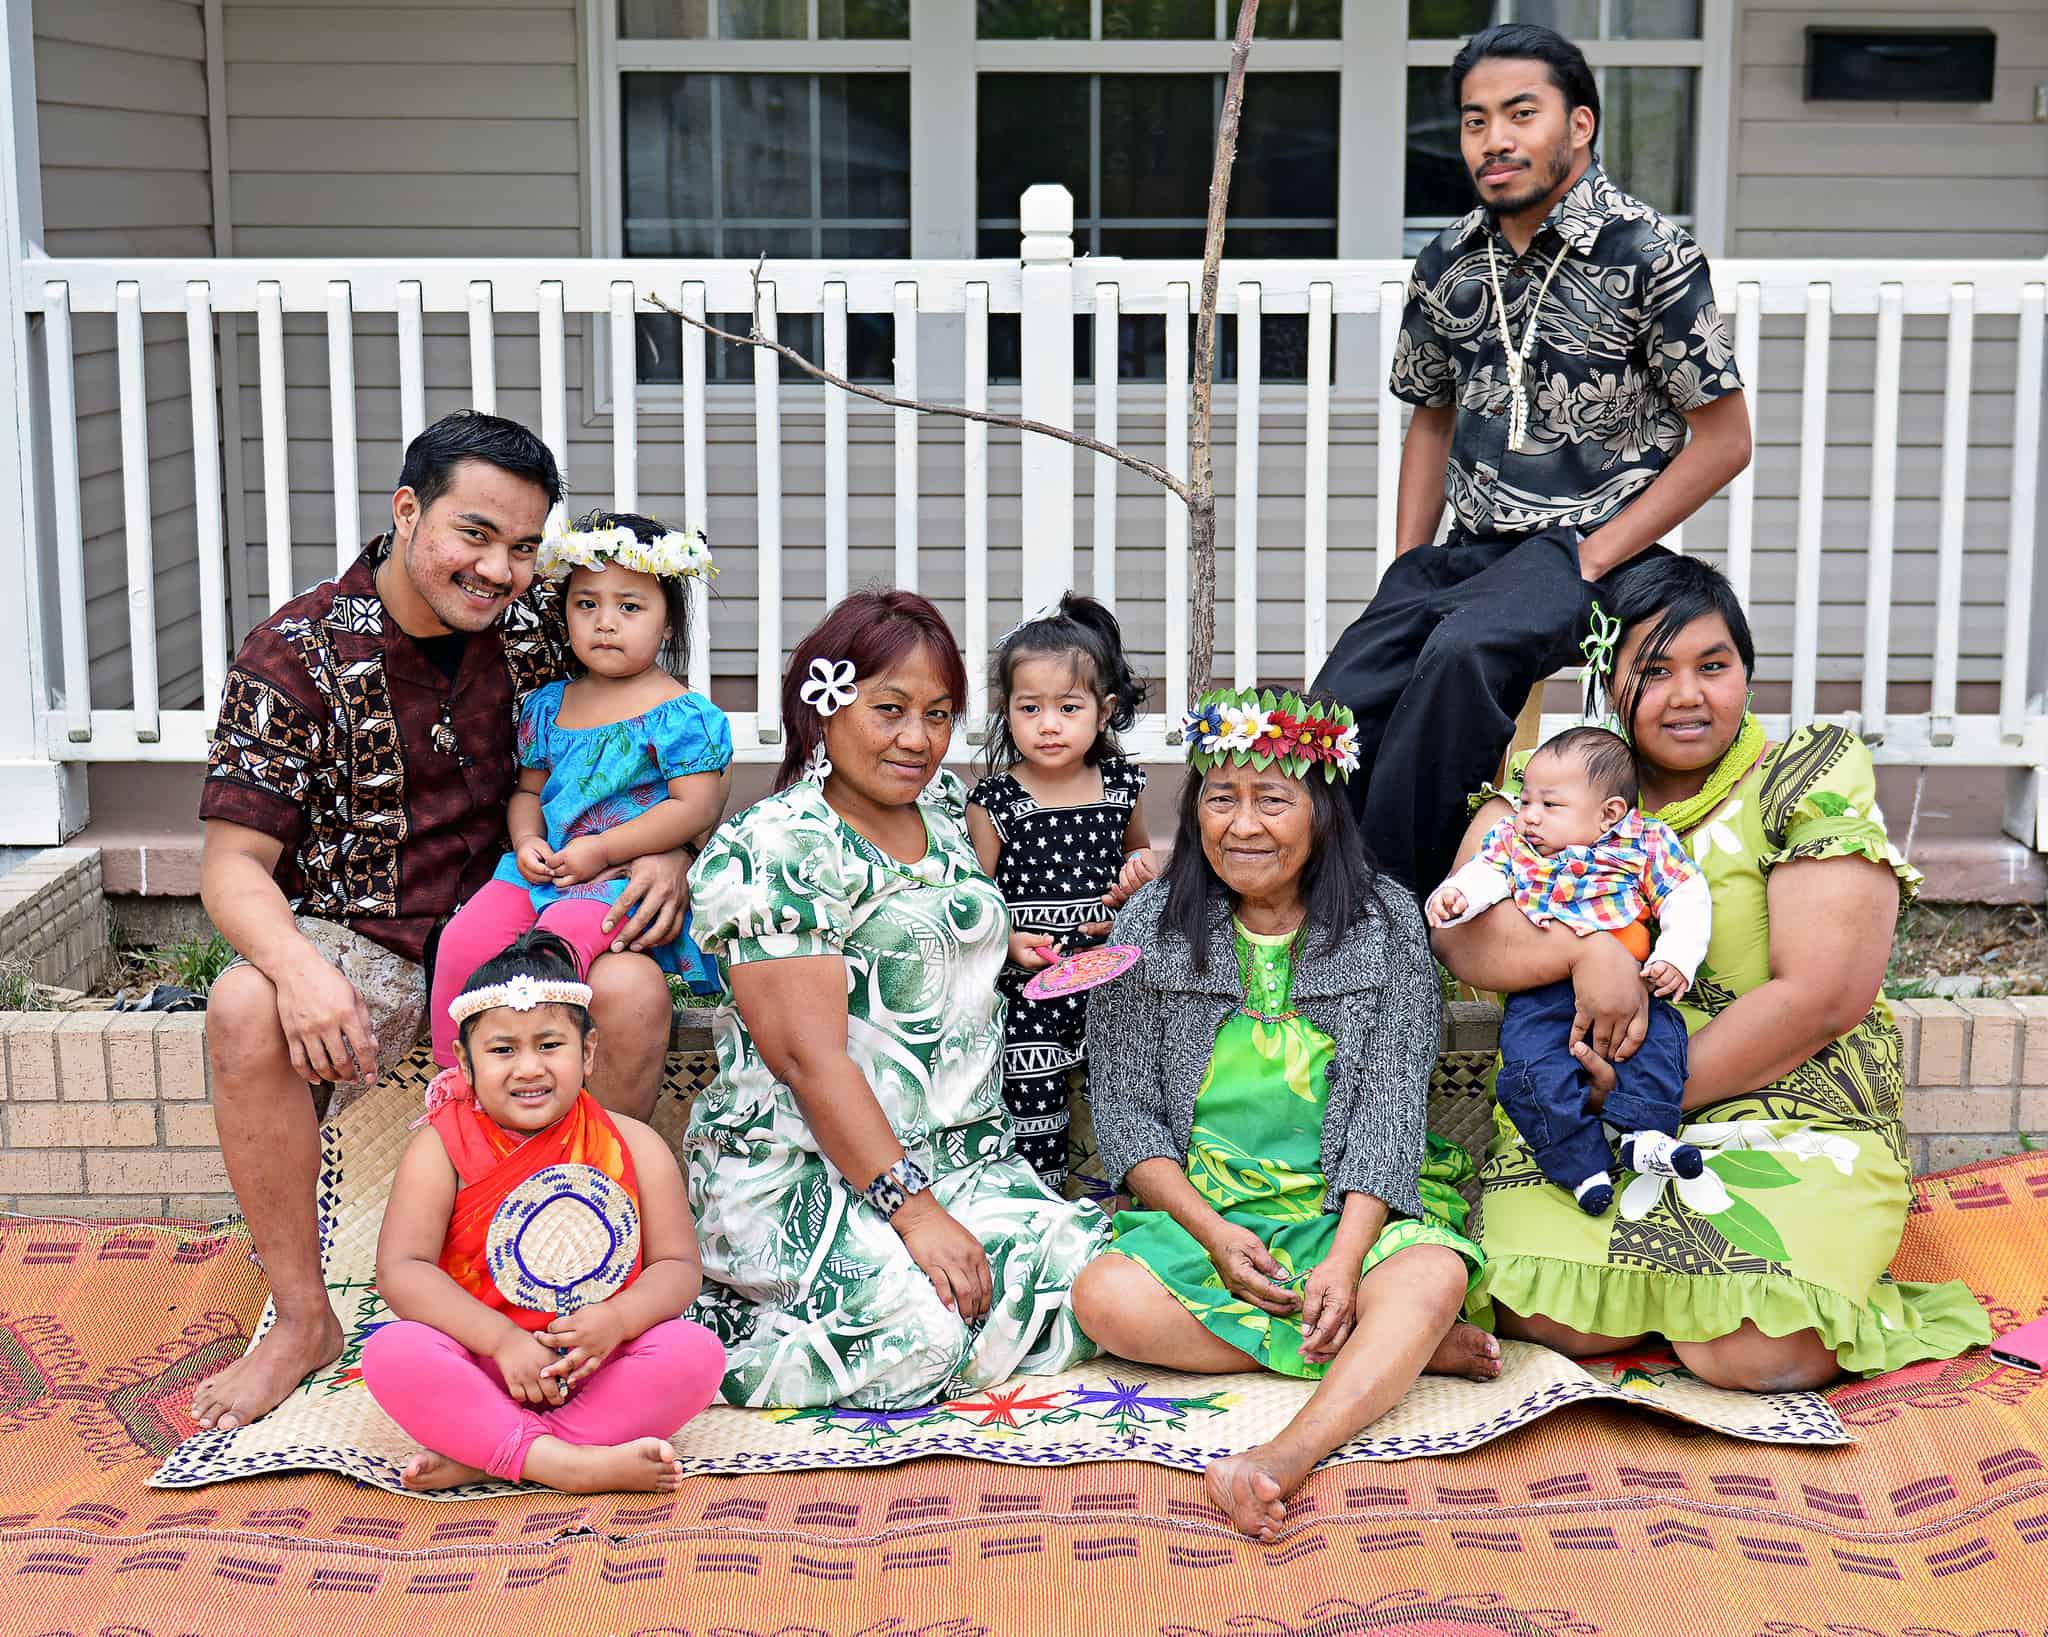 Marshallese diabetes self-management